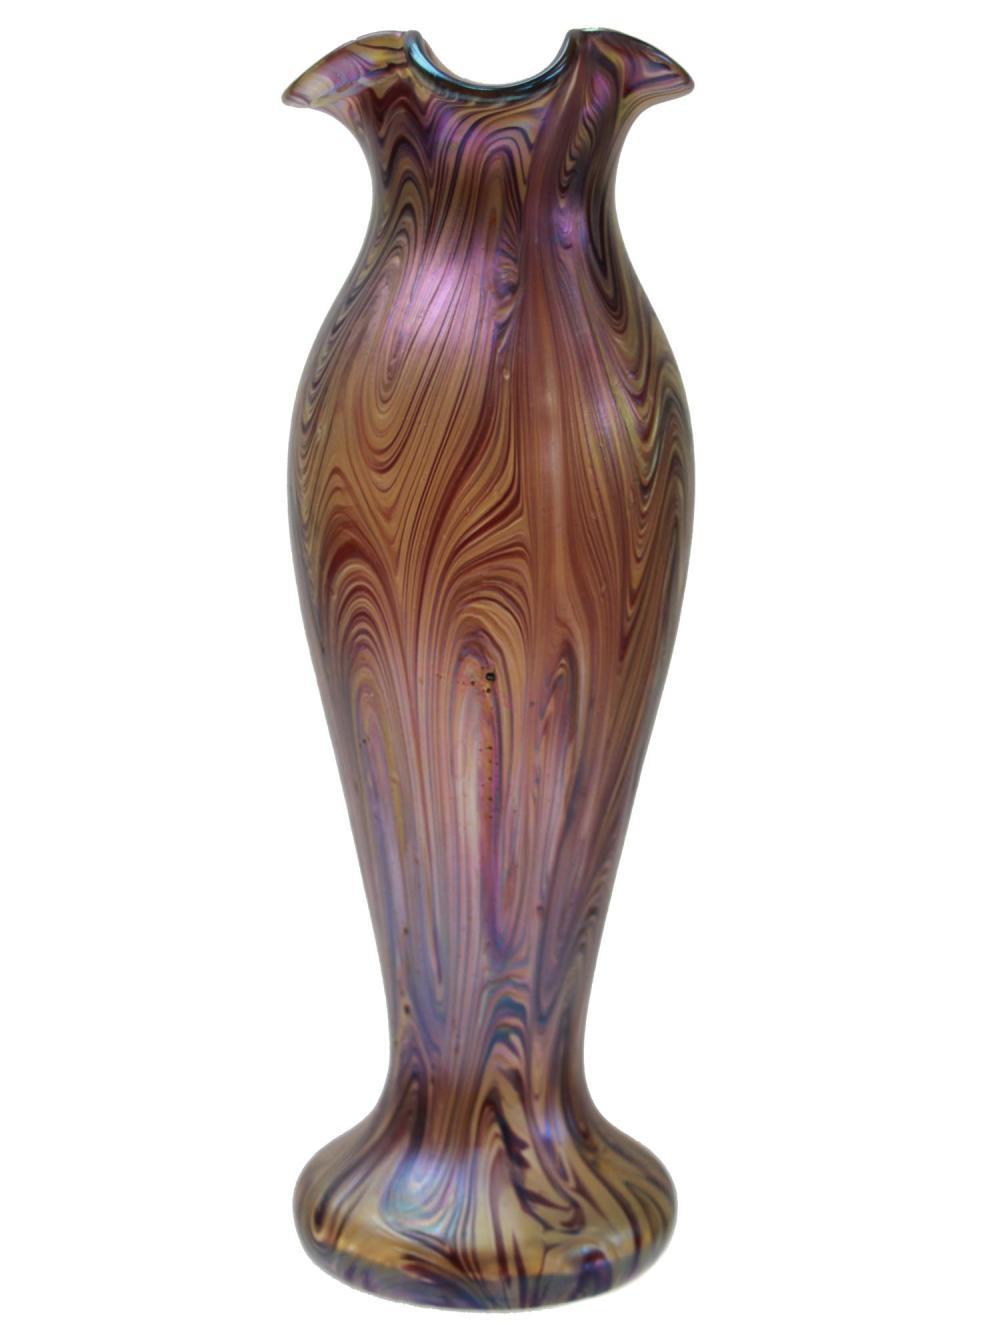 A LOETZ IRIDESCENT BOHEMIAN ART GLASS VASE